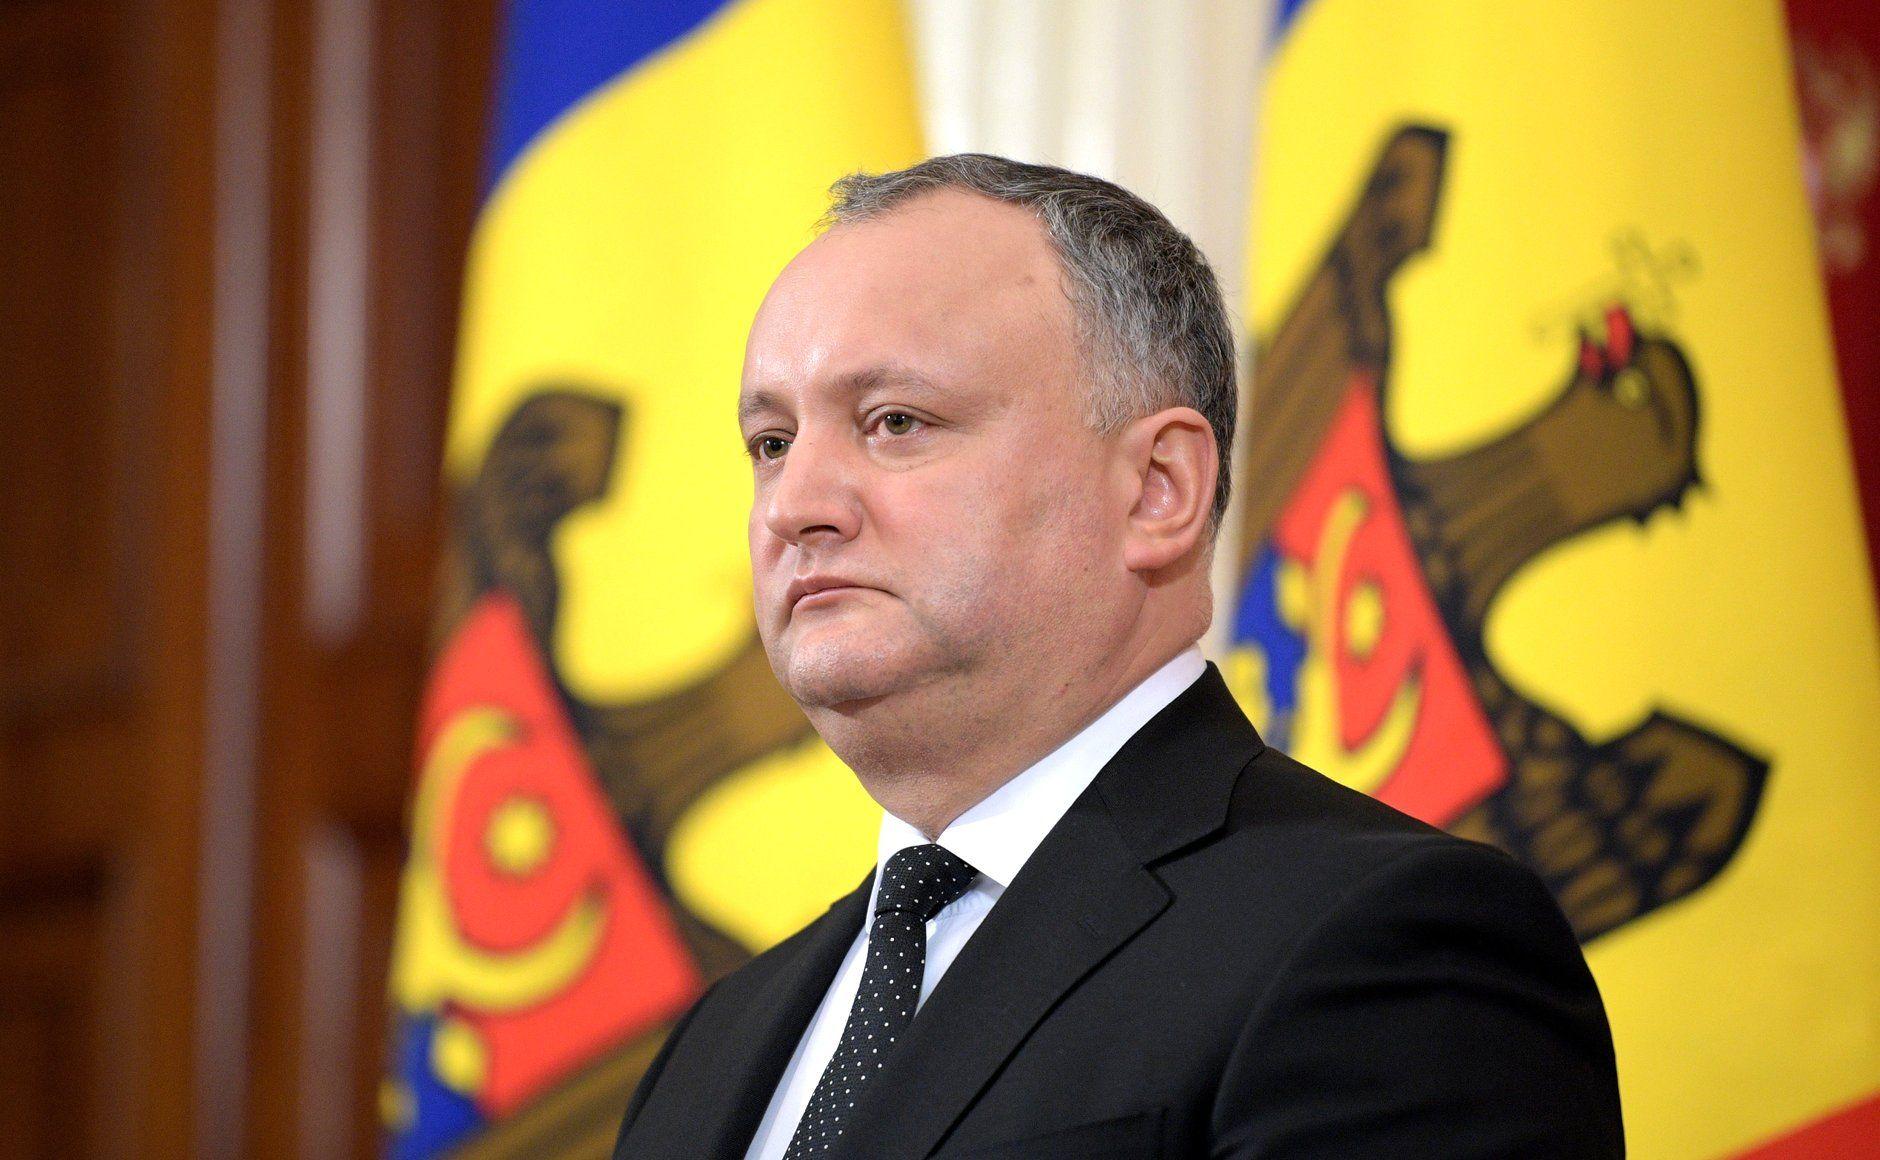 Игорь Додон, Молдова, президент